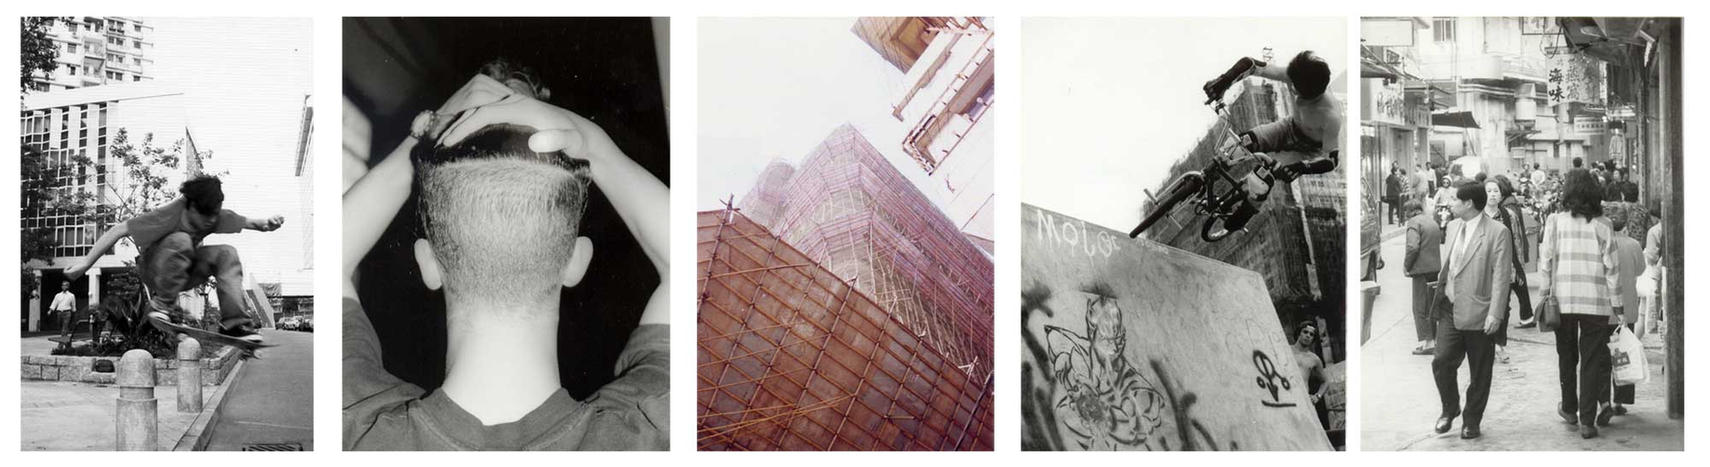 Remembering Macau by KatayClysm